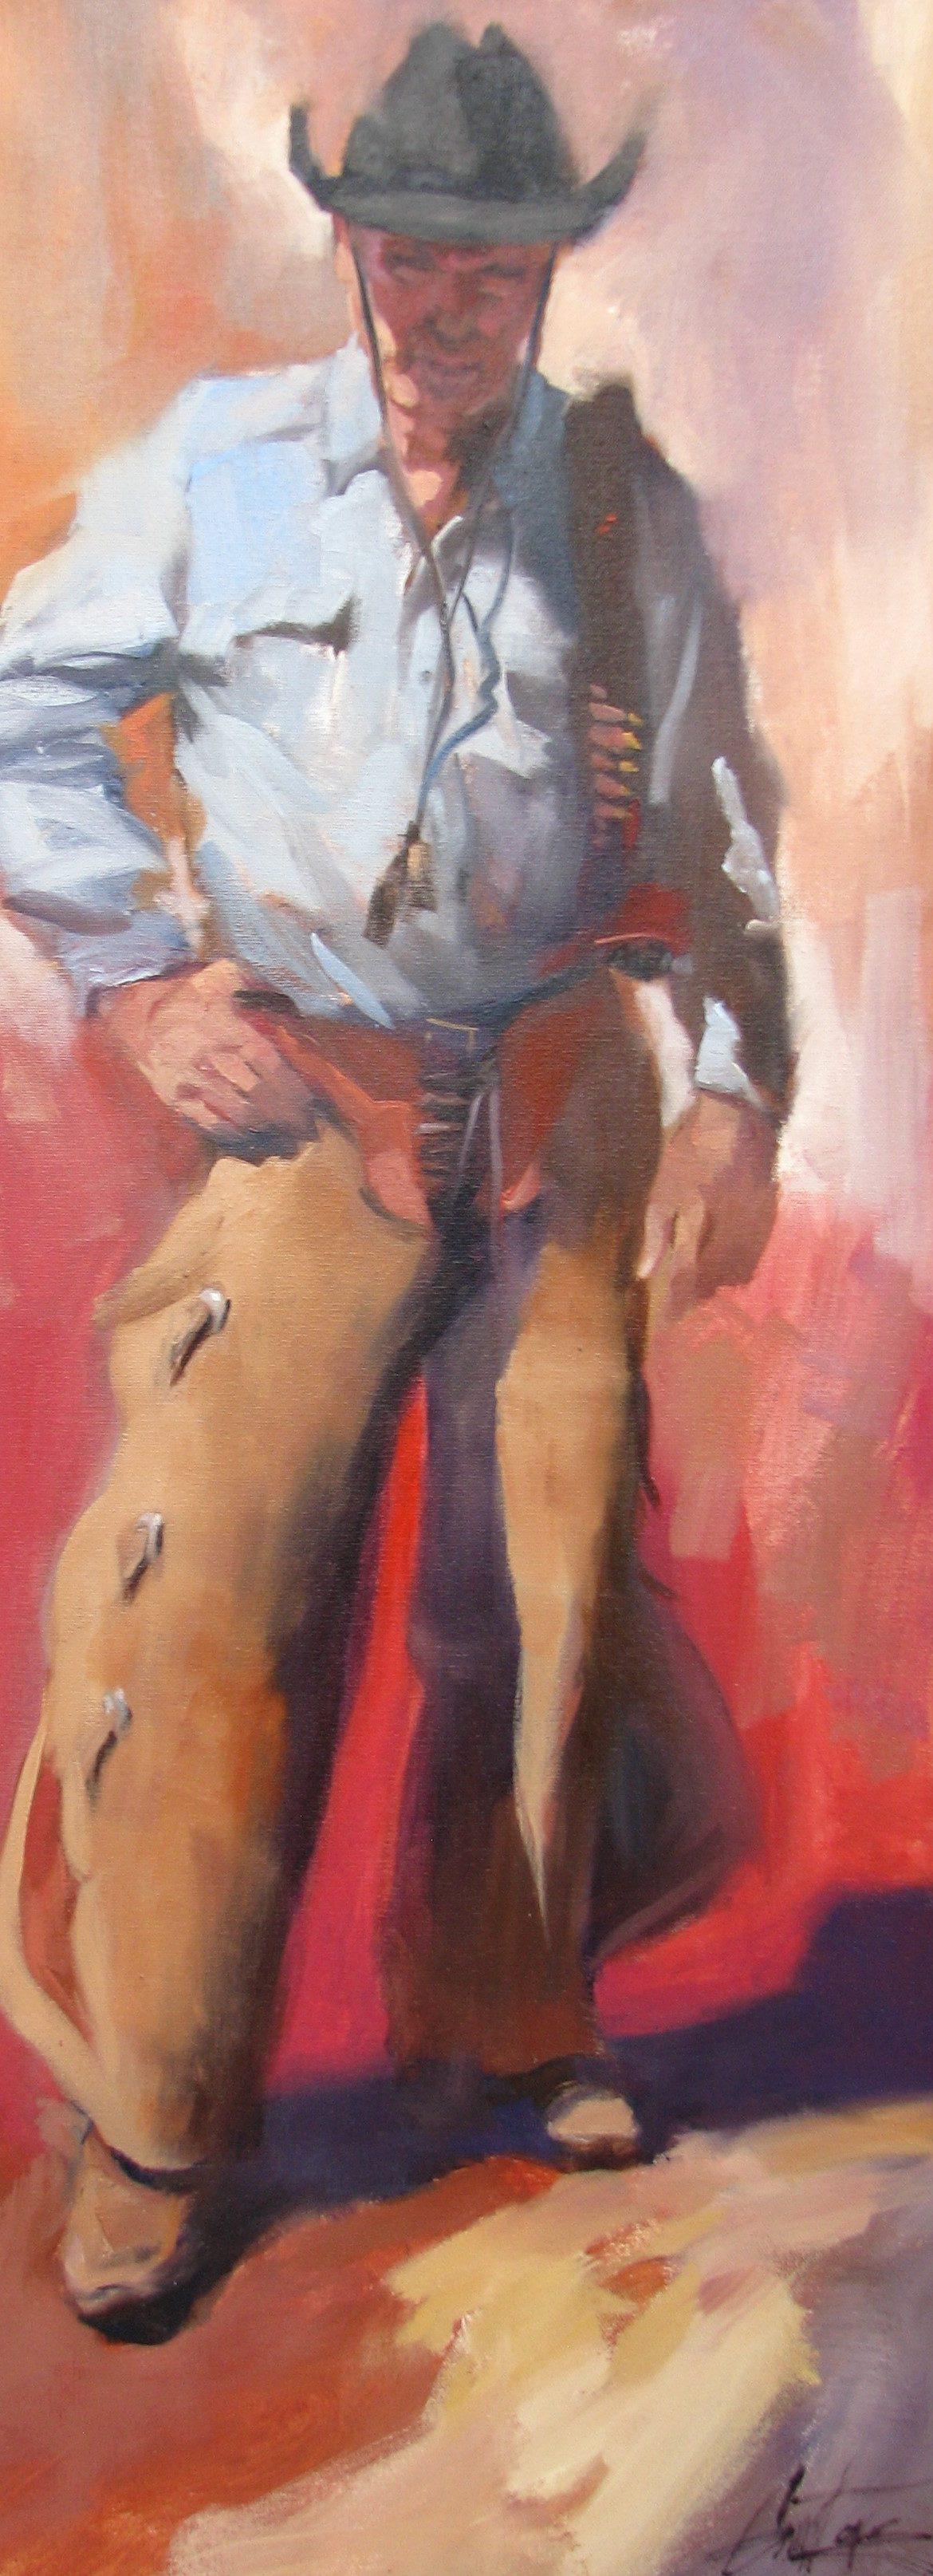 Long Hard Trail, Gretchen Lopez, Rogoway Gallery